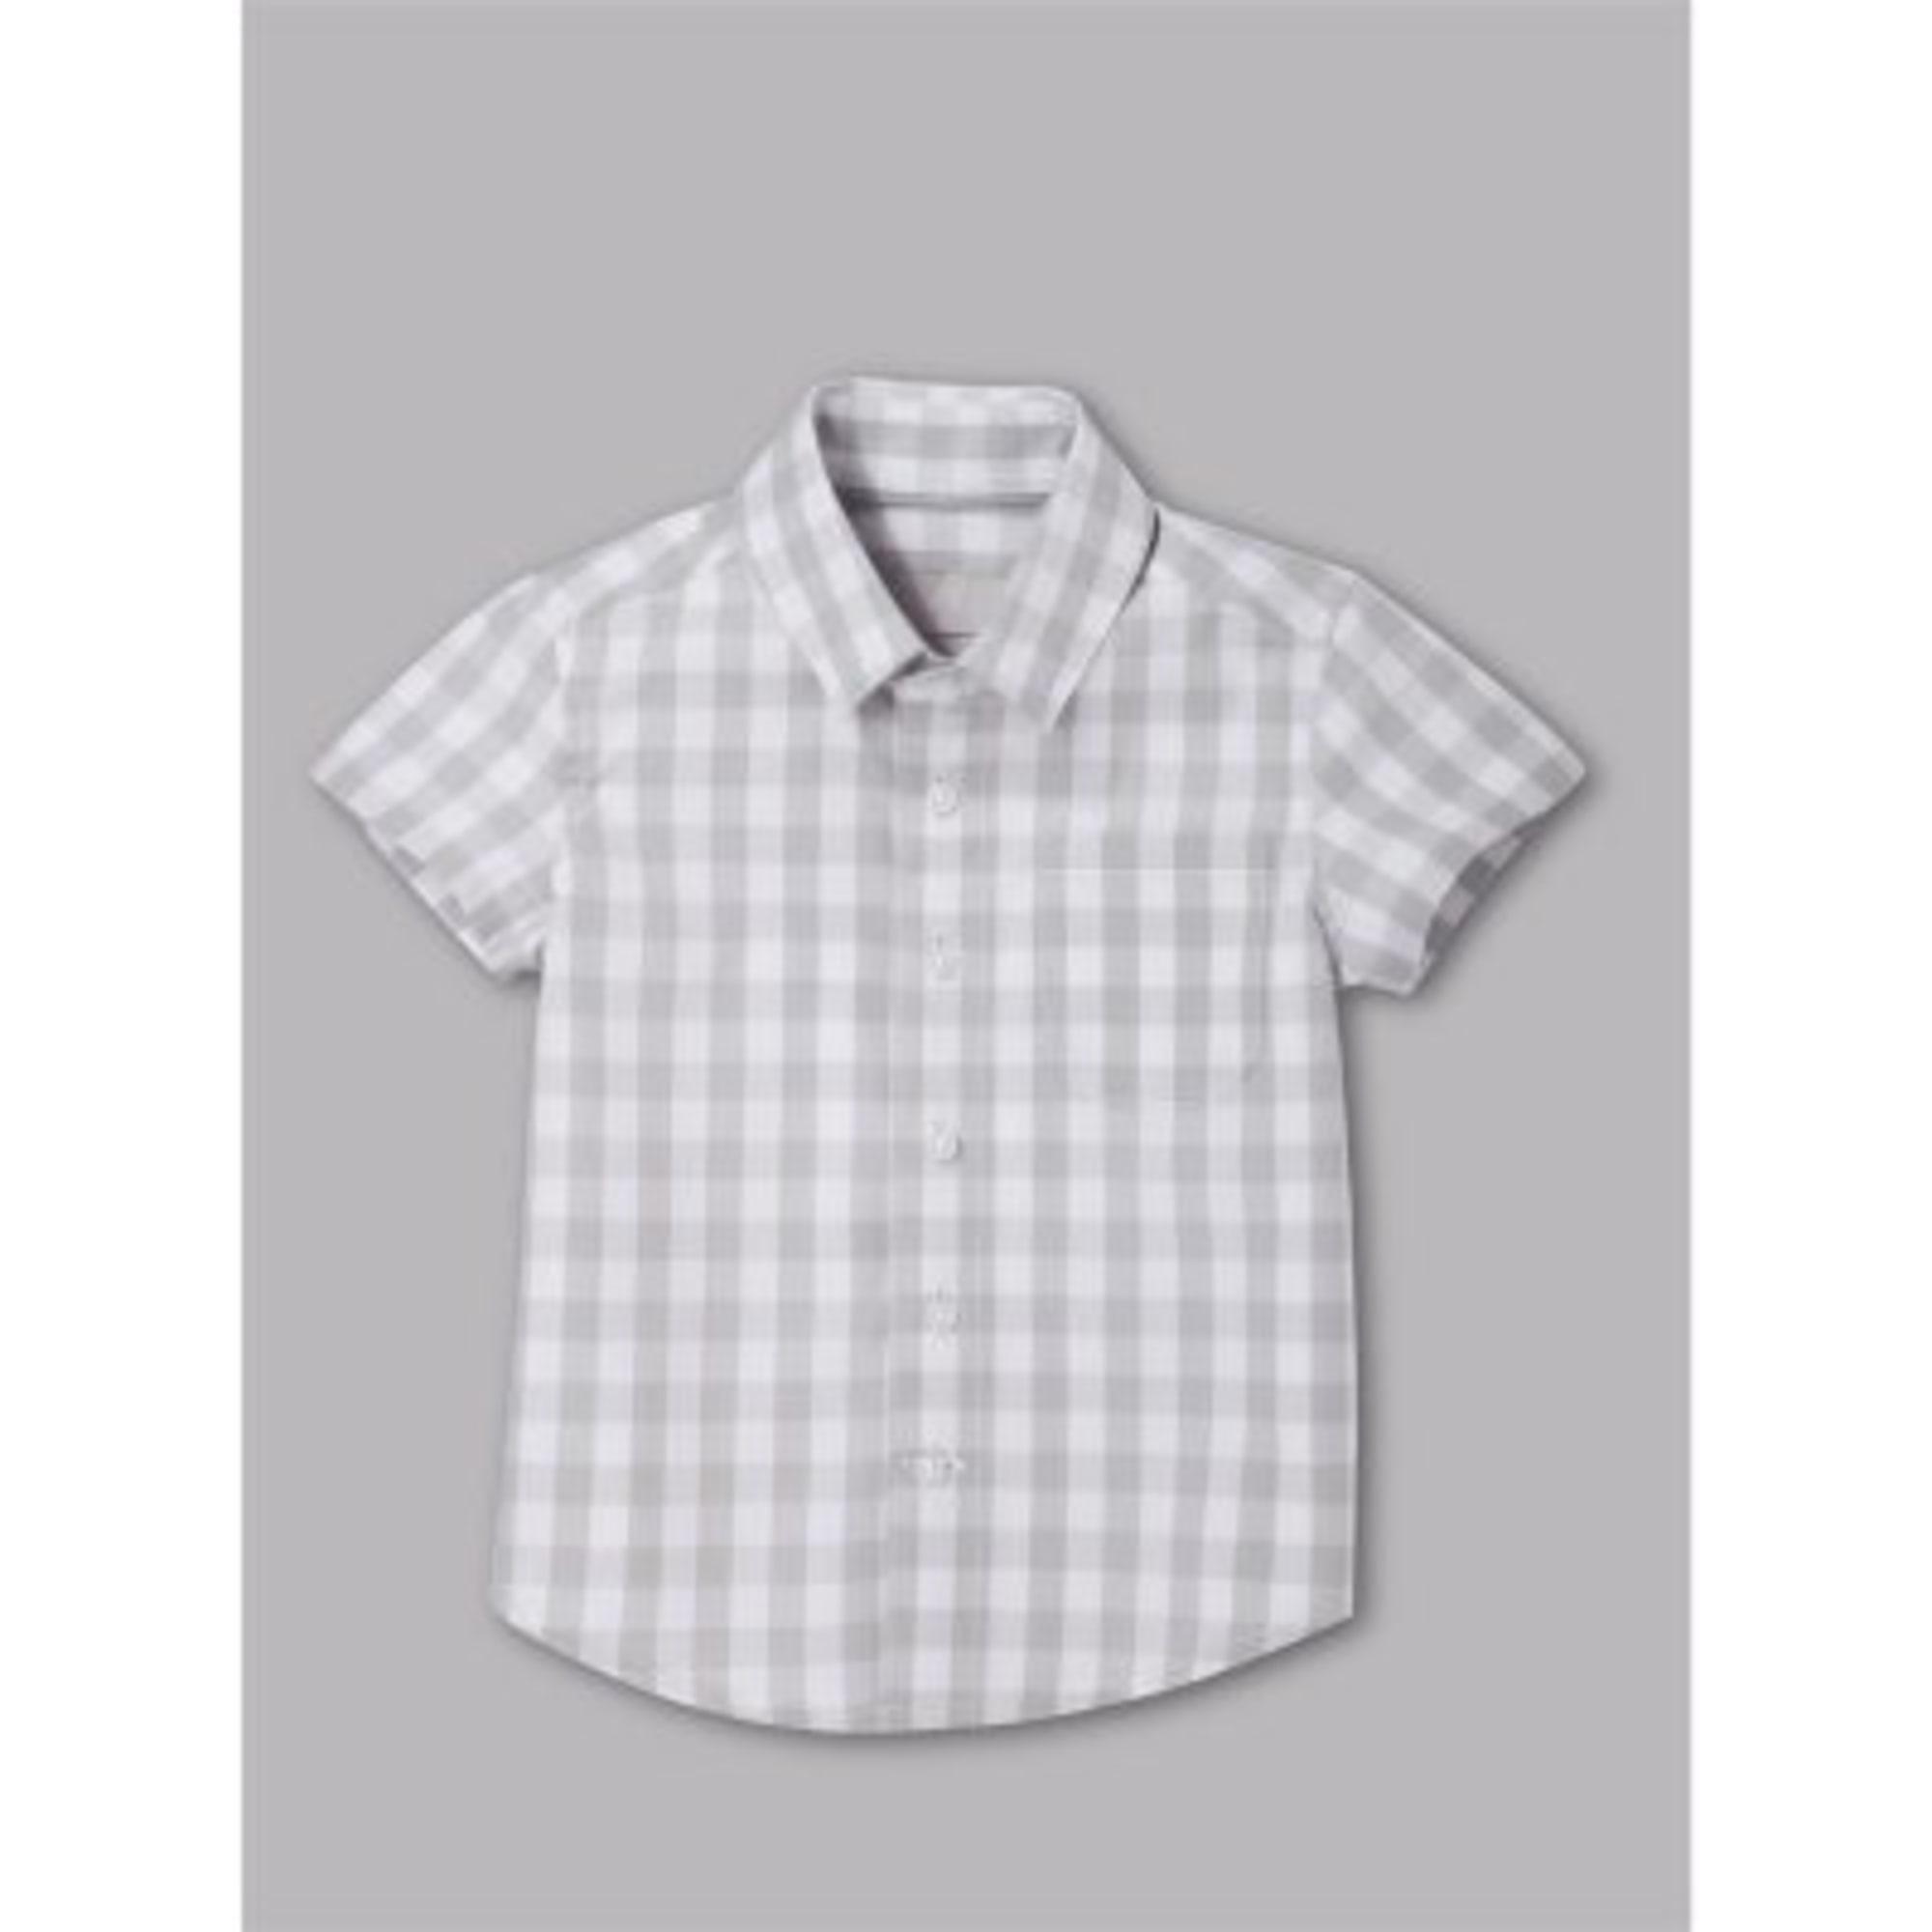 Blouse, Short-sleeved Shirt CYRILLUS Gray, charcoal